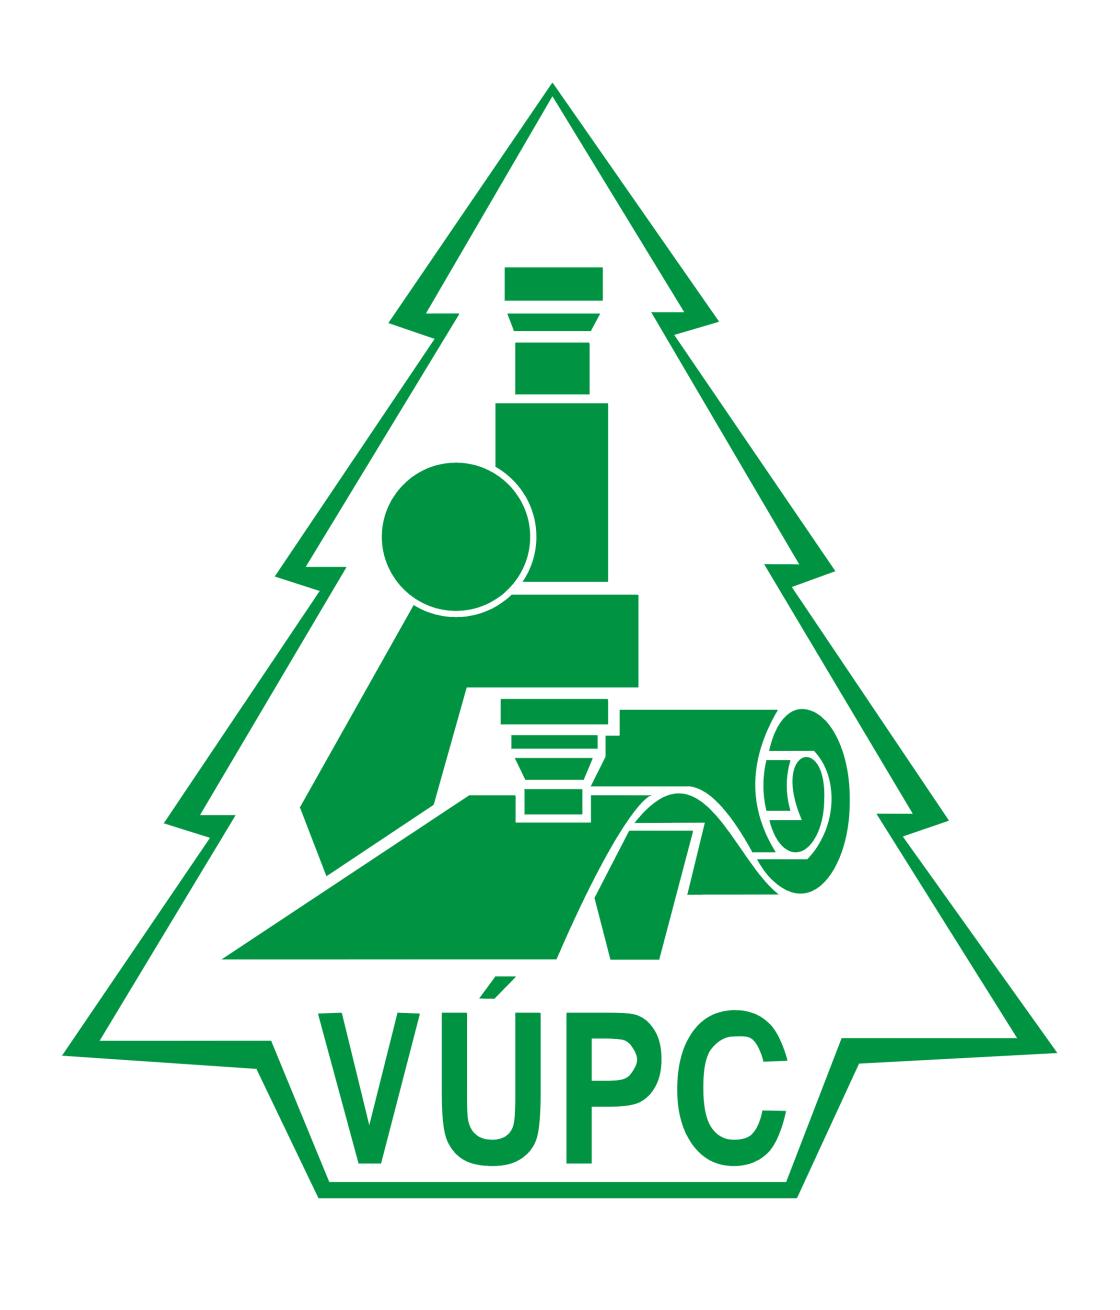 vupc.png